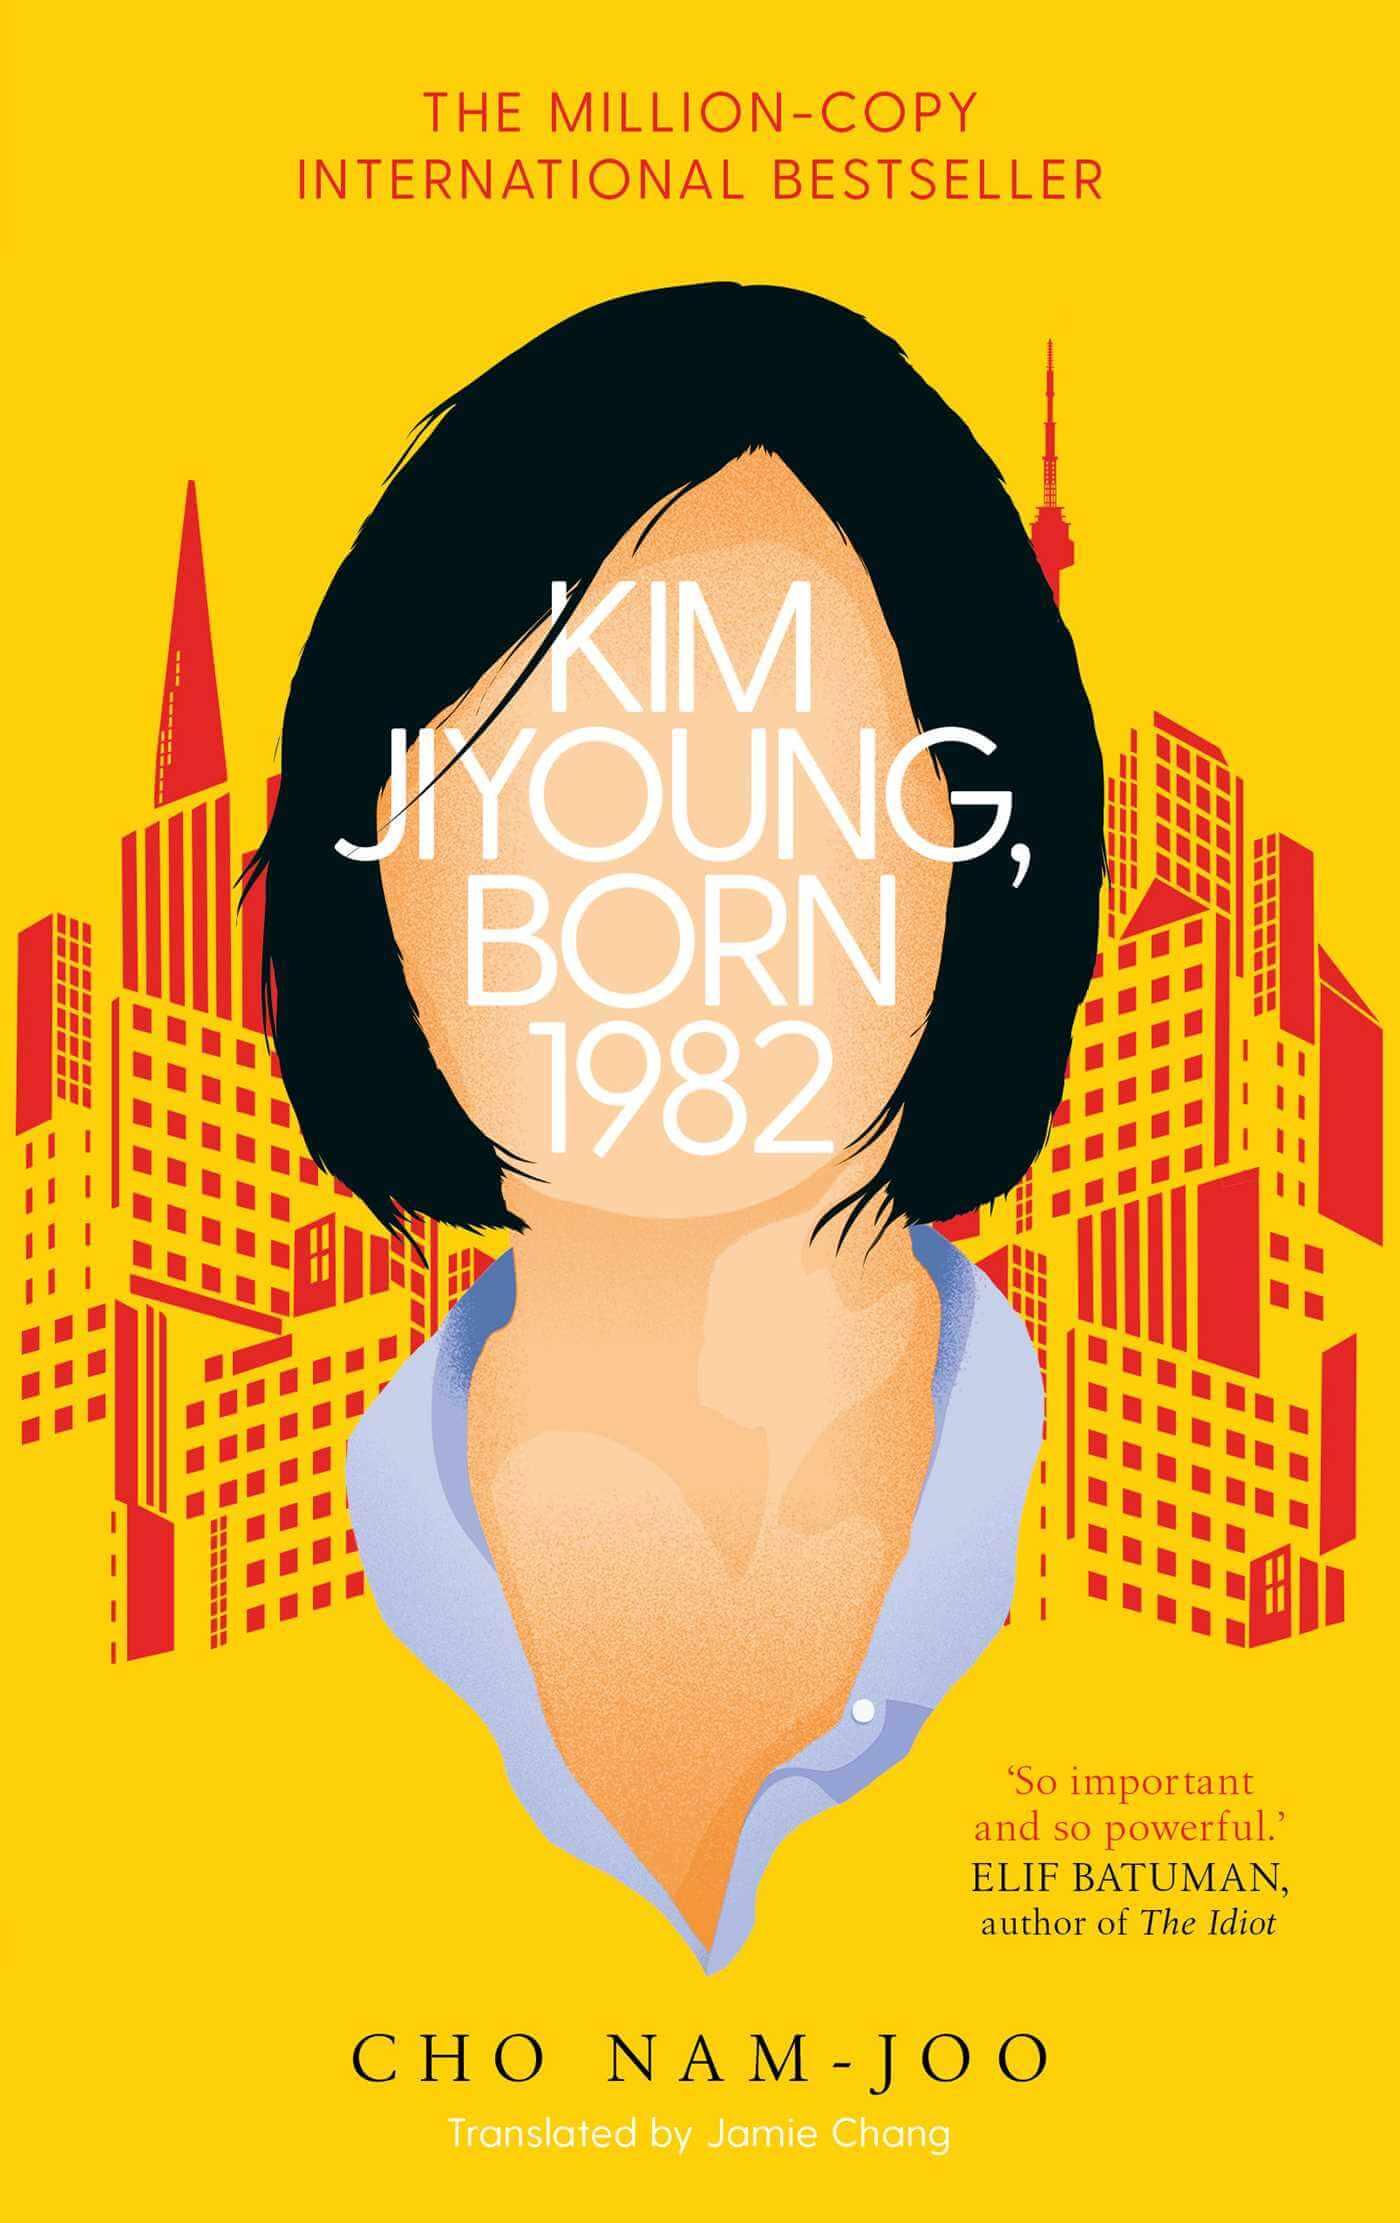 Kim Jiyoung, Born 1982 by Cho Namjoo